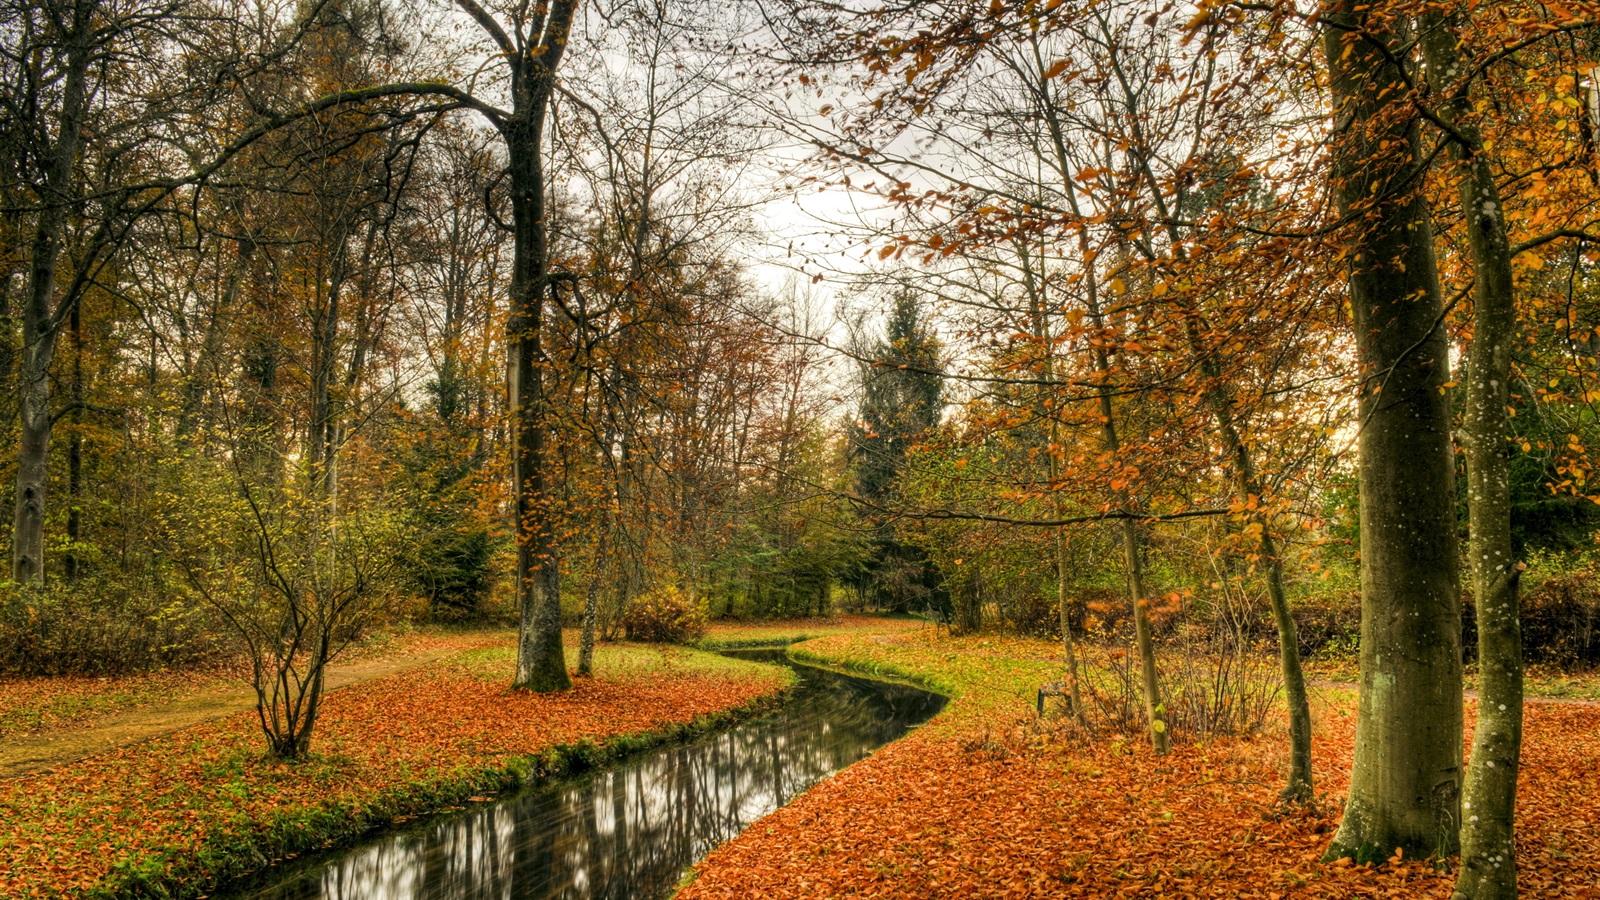 autumn nature river - photo #42